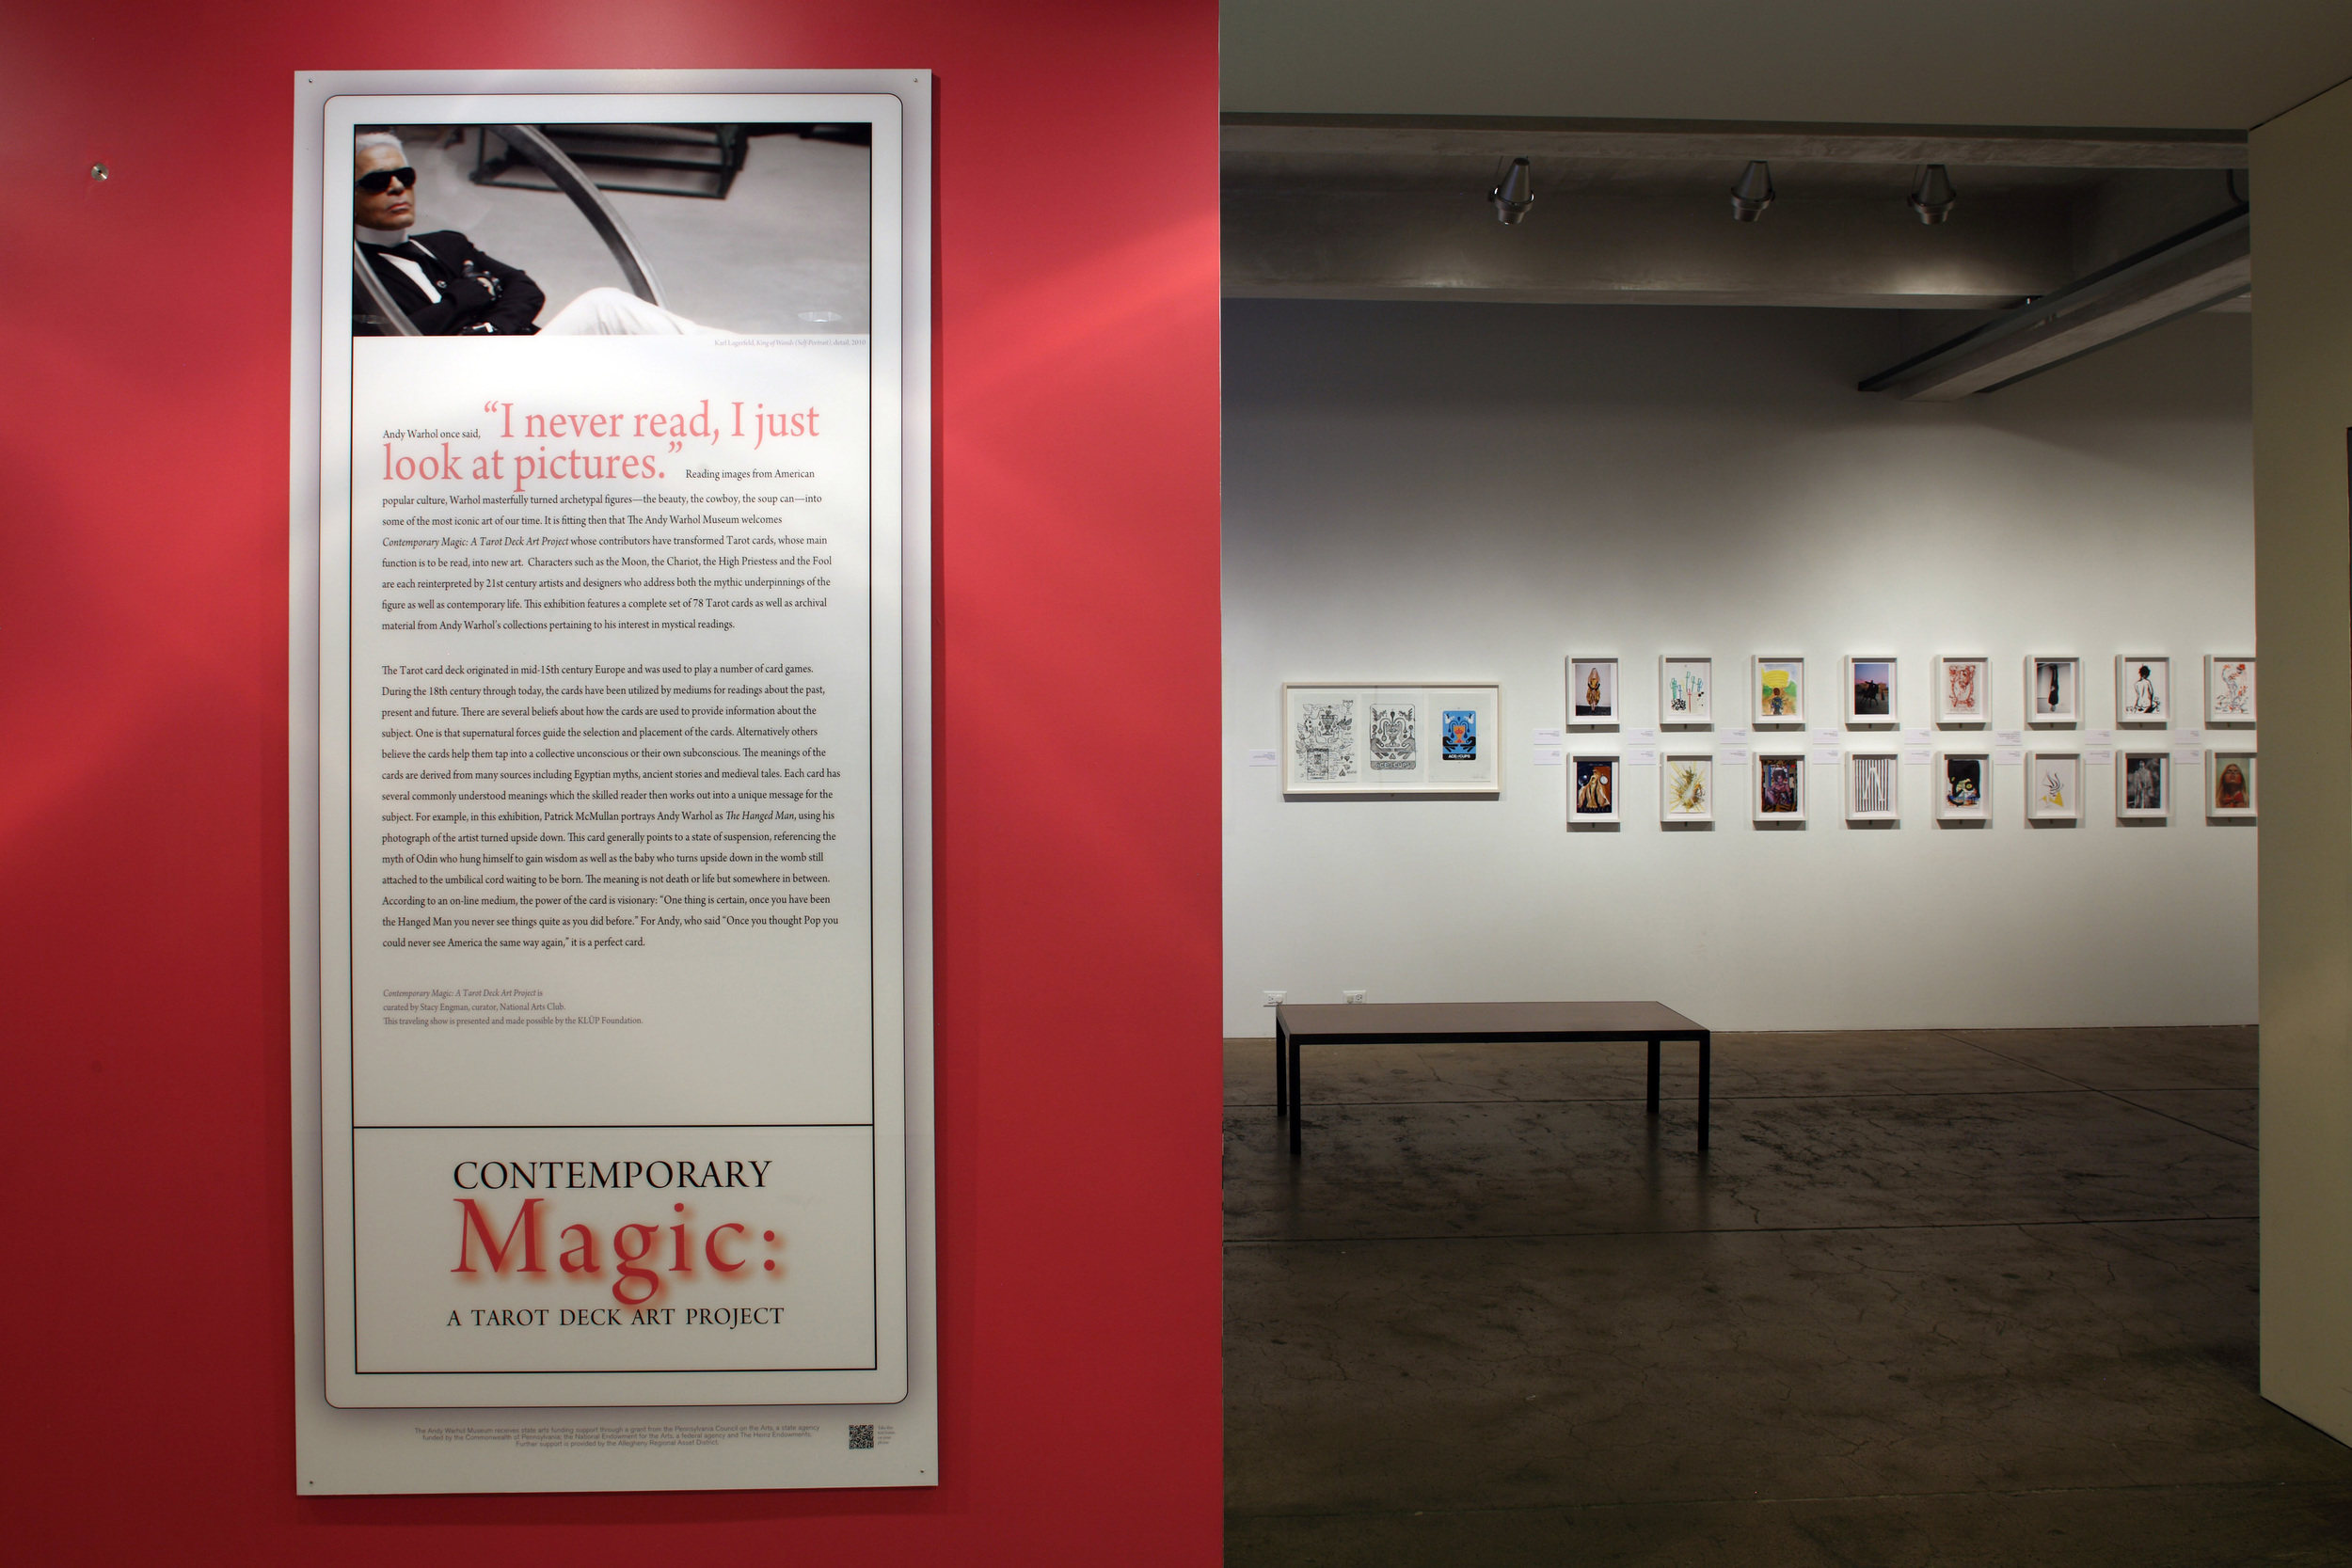 Contemporary Magic - A Tarot Deck Art Project at AWM, 2011 0001.JPG